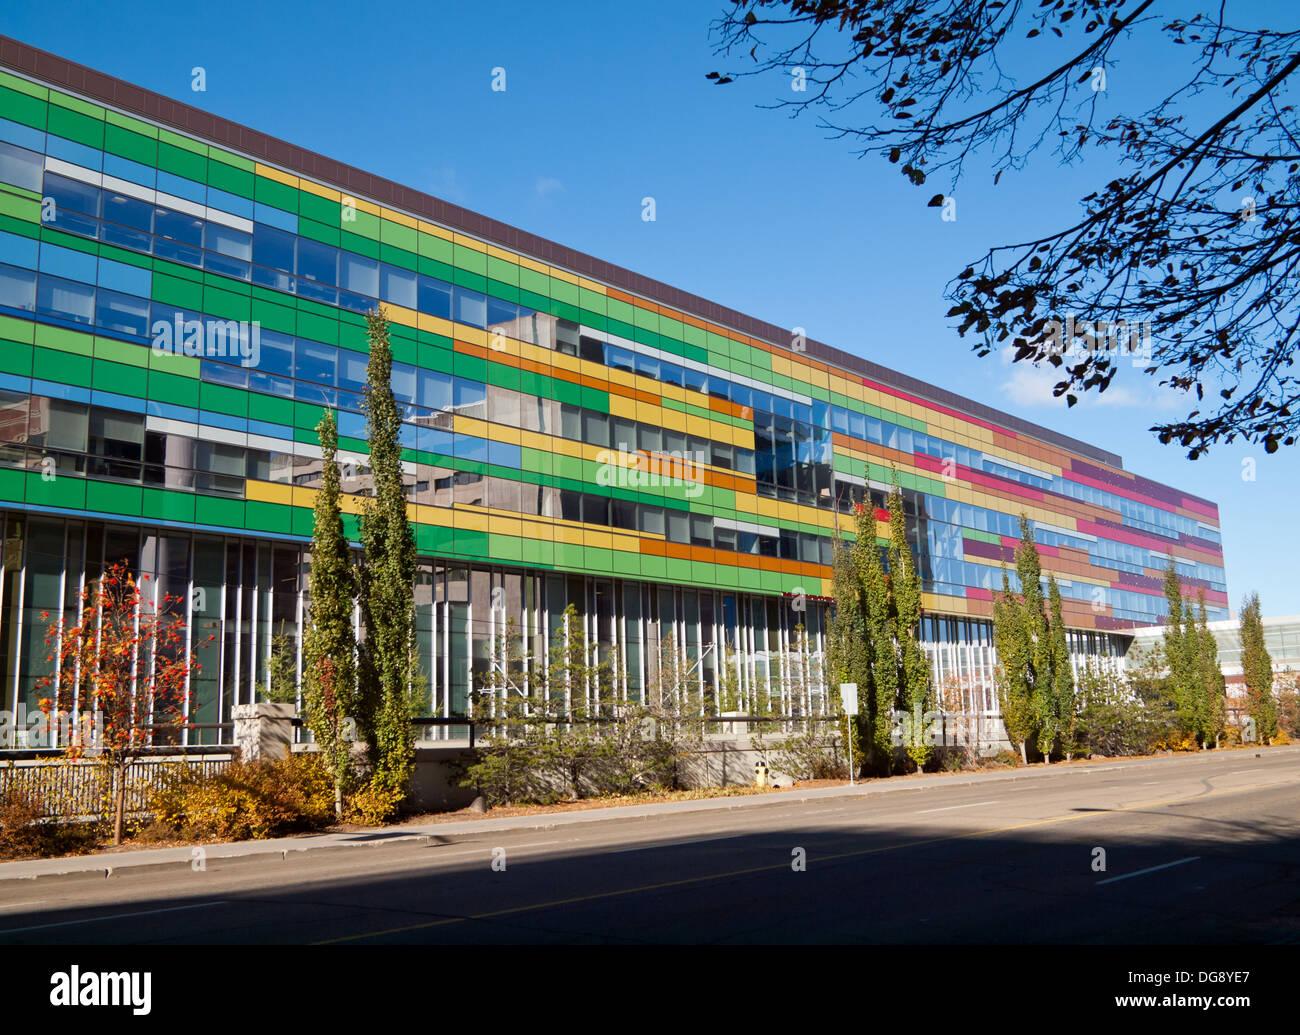 The colorful Edmonton Clinic Health Academy on the campus of the University of Alberta in Edmonton, Alberta, Canada. - Stock Image